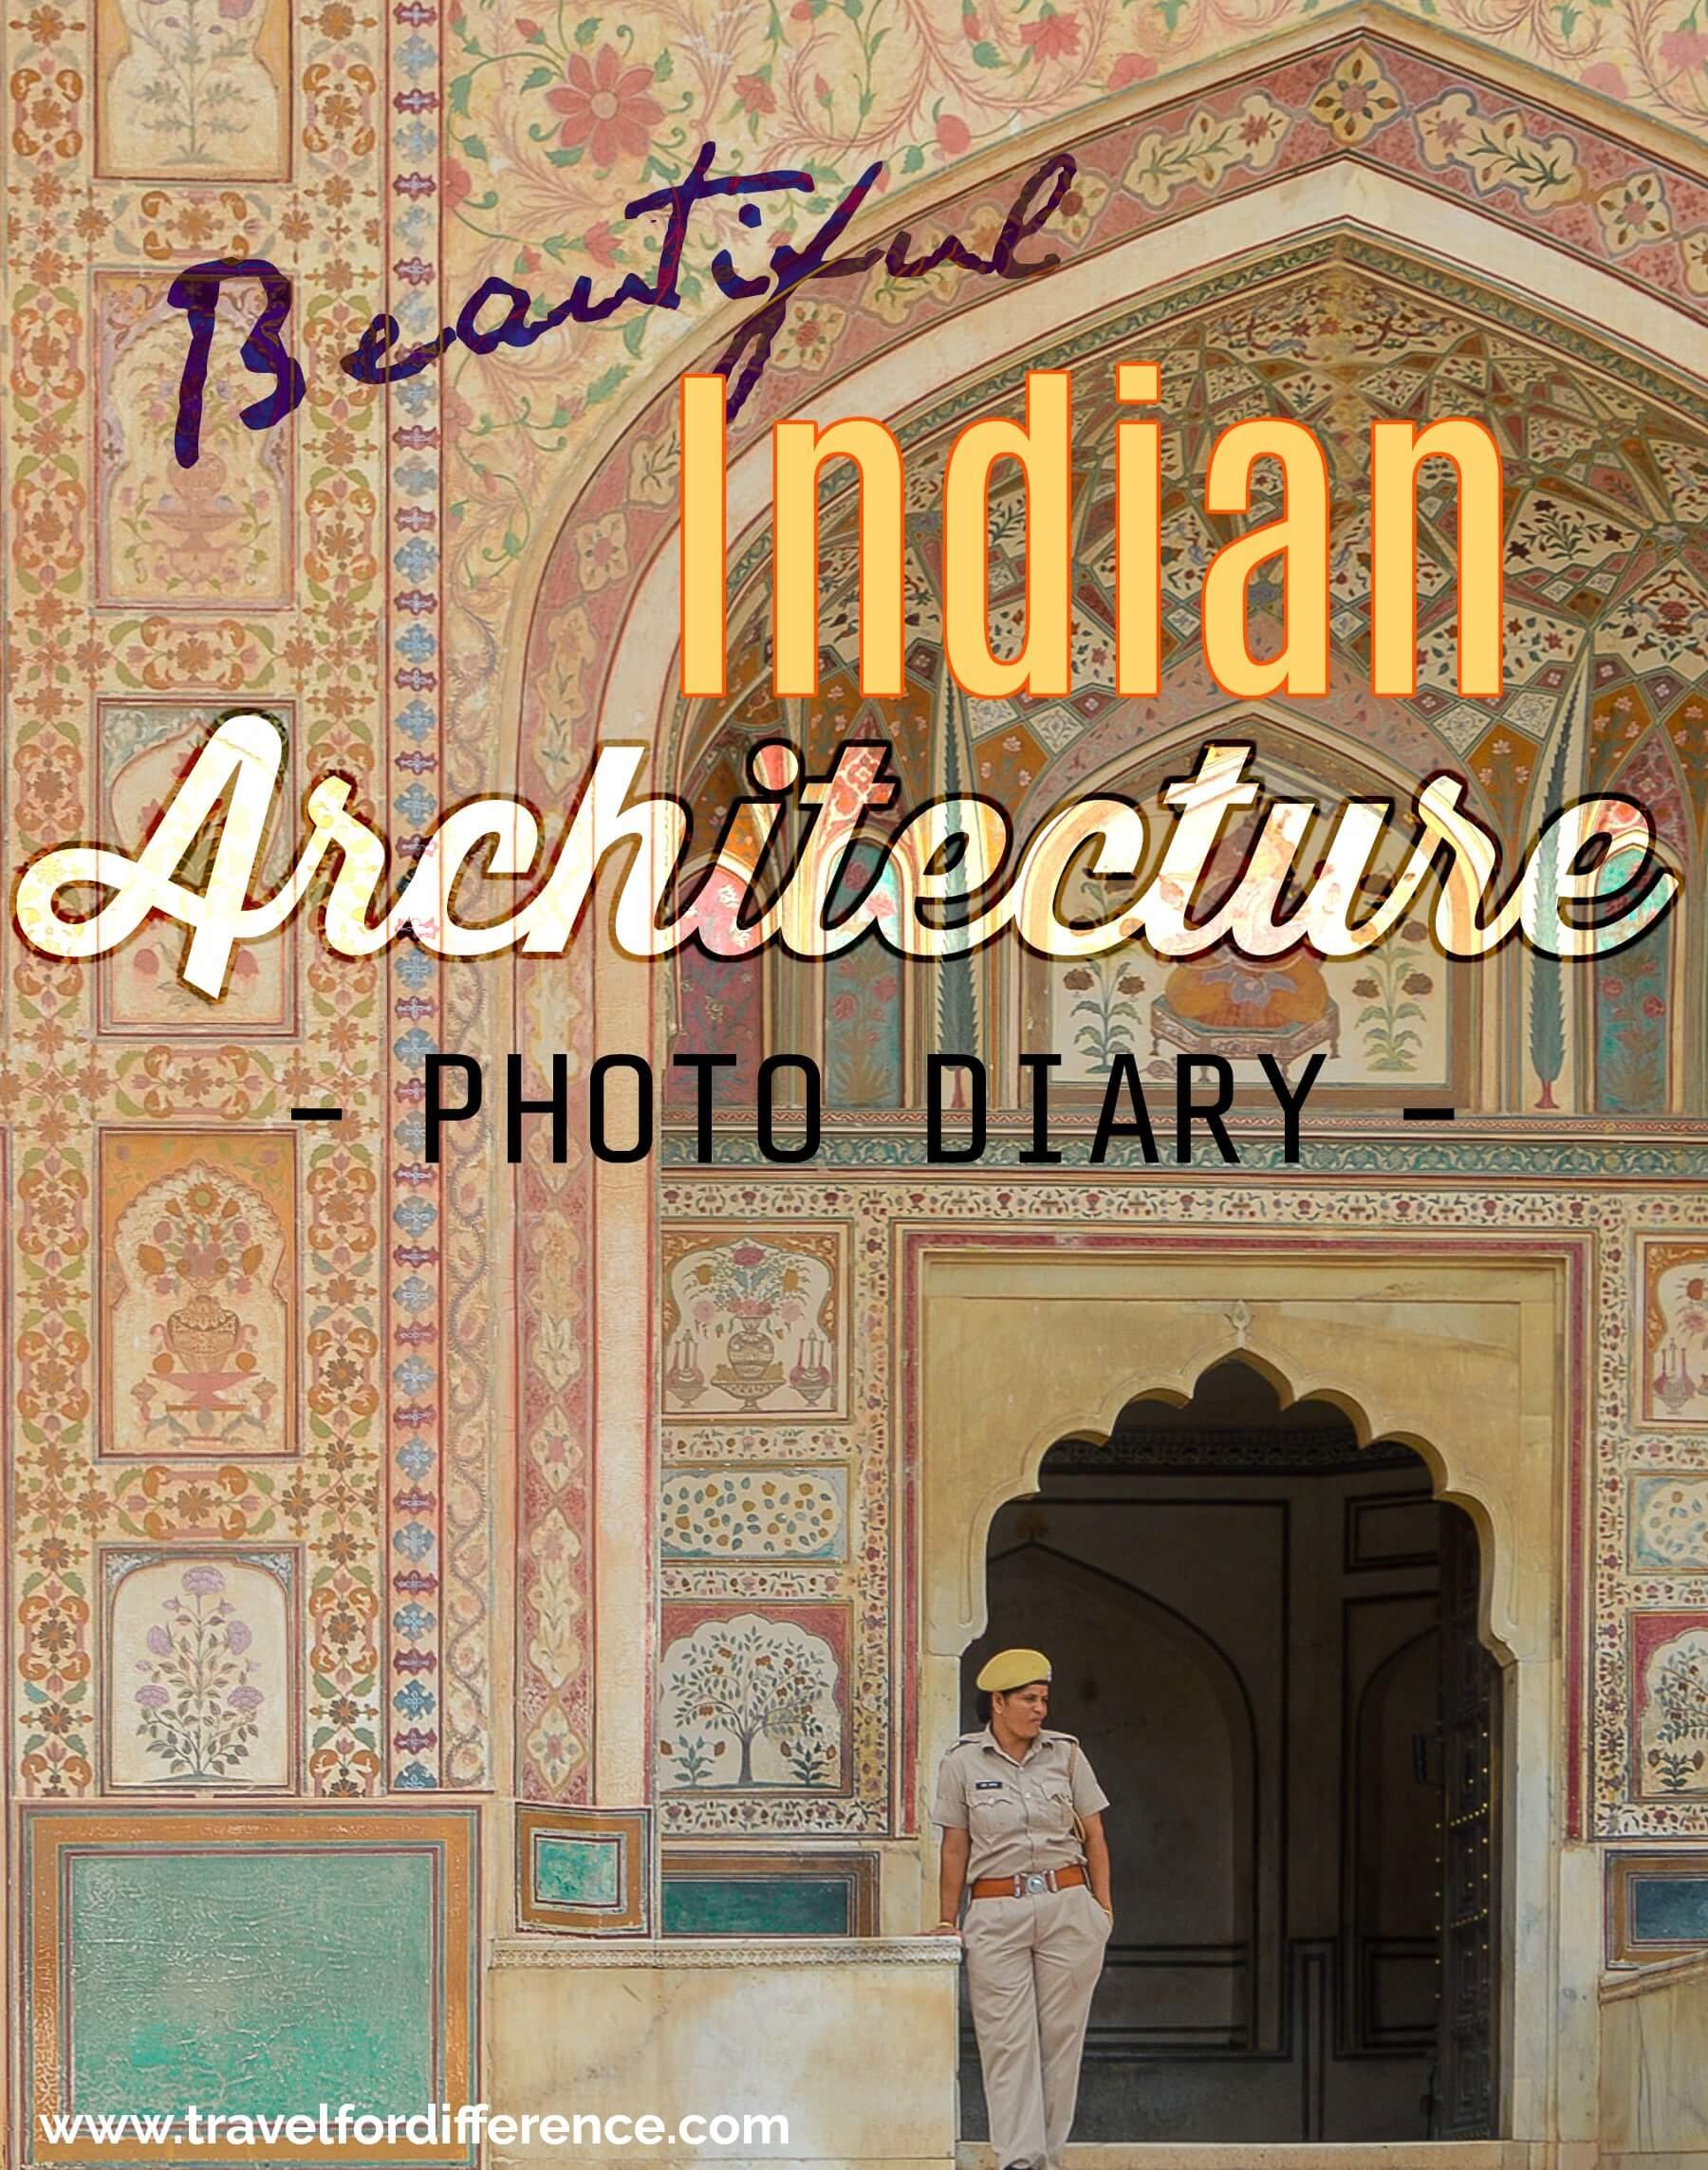 Beautiful Indian Architecture - Photo Diary